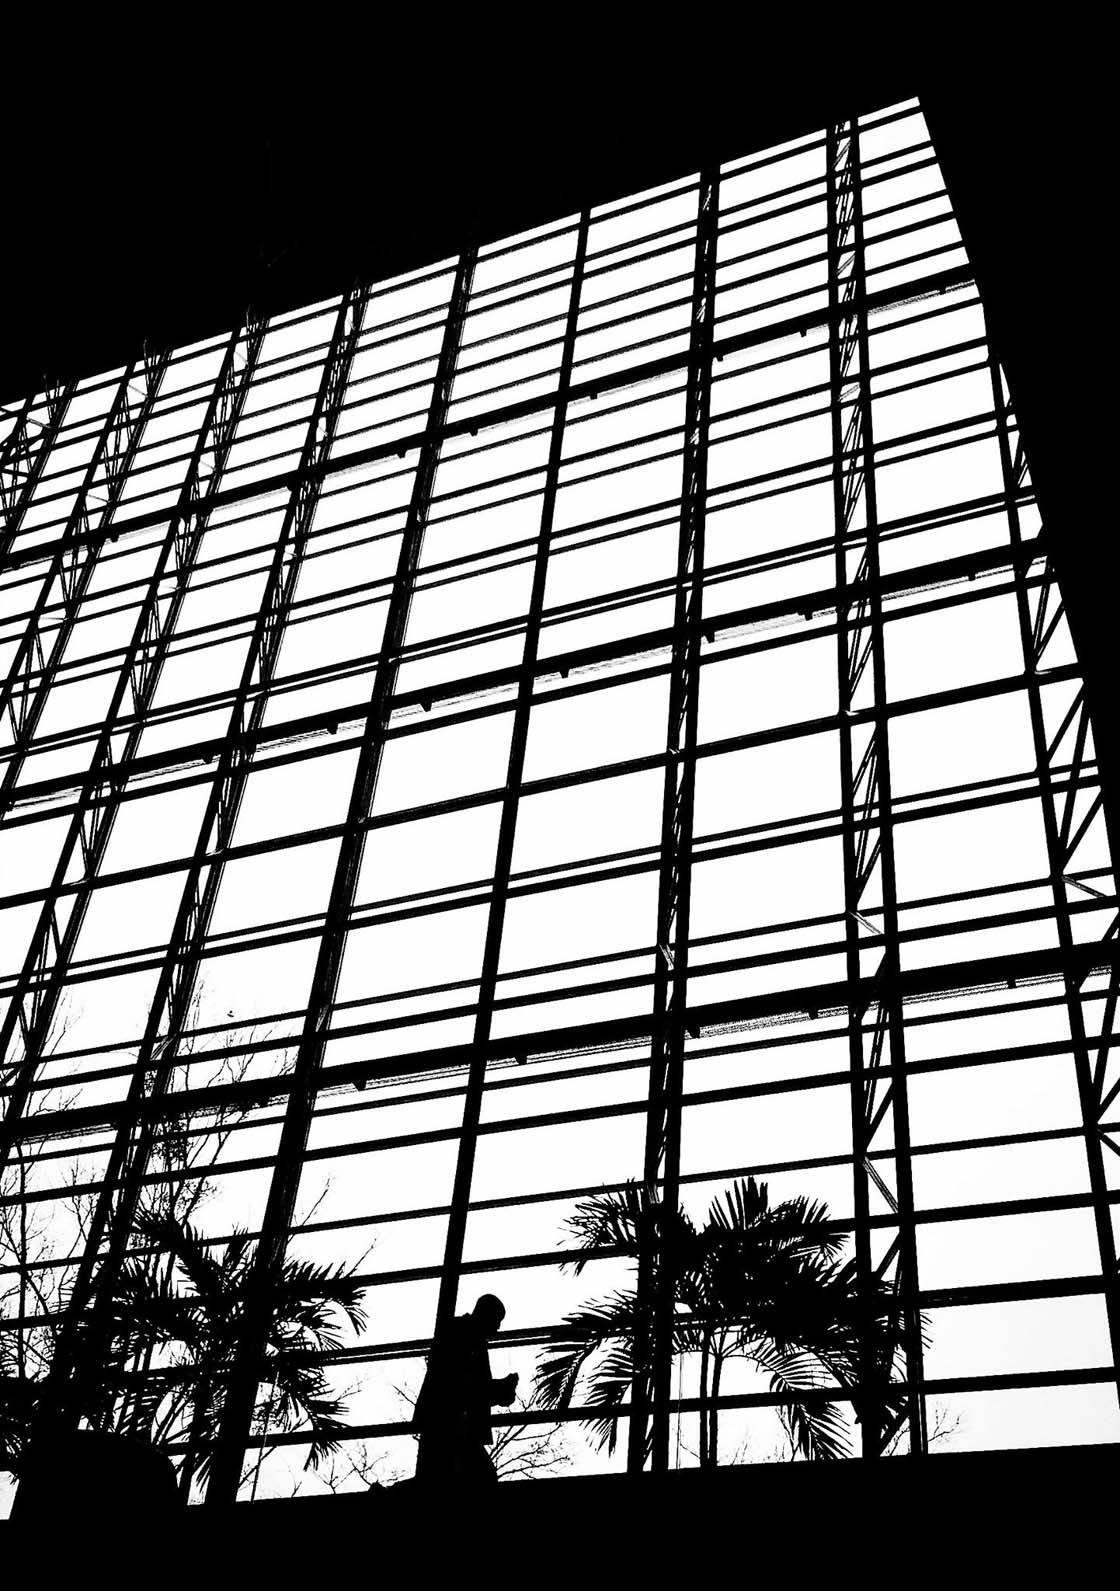 iPhone Photos Of Architecture 12 no script